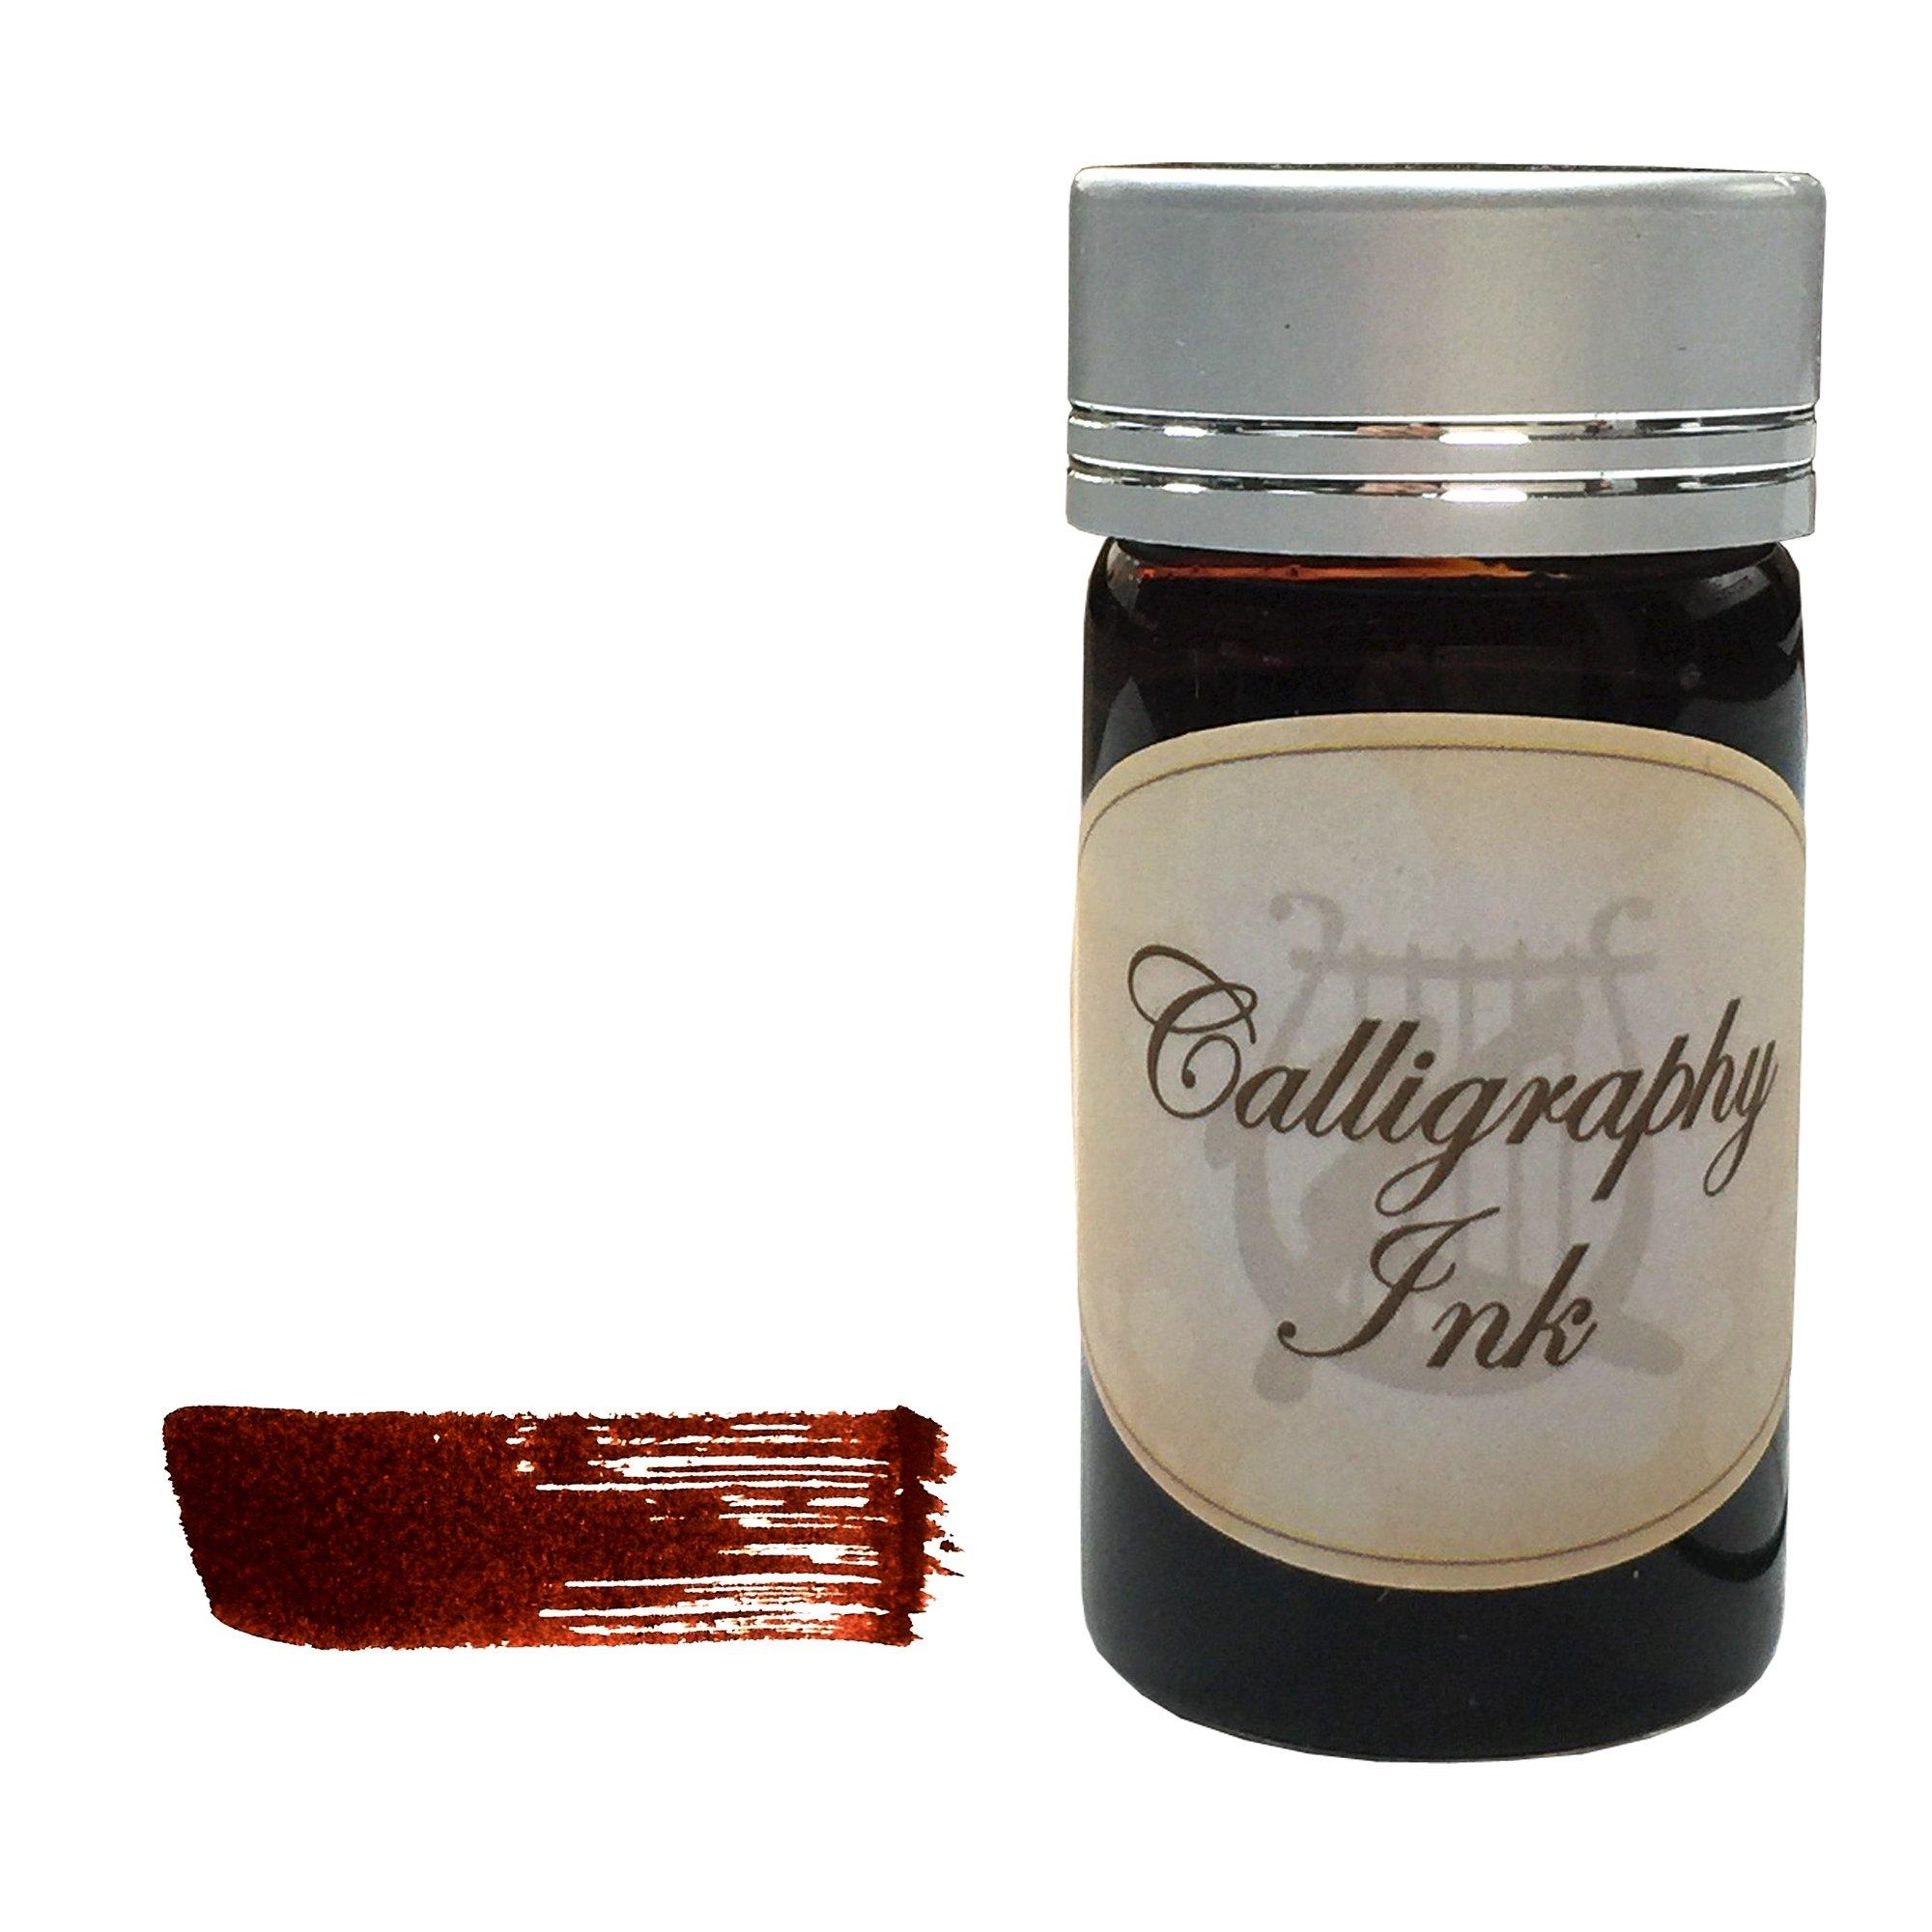 Kentaur Standard Bottle Ink Set - 25 ml (5 Color) - For Fountain Pens, Dips Pens, Ink Refills, and Calligraphy by Kentaur (Image #7)